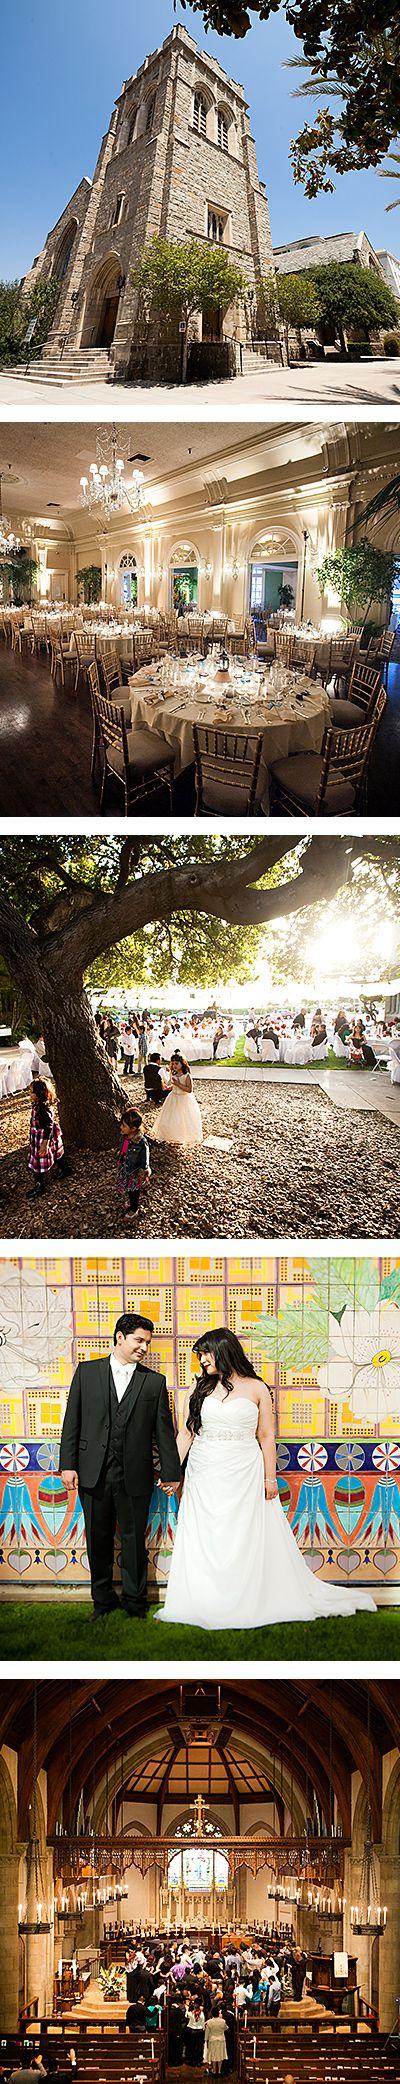 Amazing list of over 75 Pasadena Wedding Venues.   Southern California Wedding Venues: Monster List of Pasadena Wedding Venues via Russell Gearhart Photography (www.gearhartphoto.com).